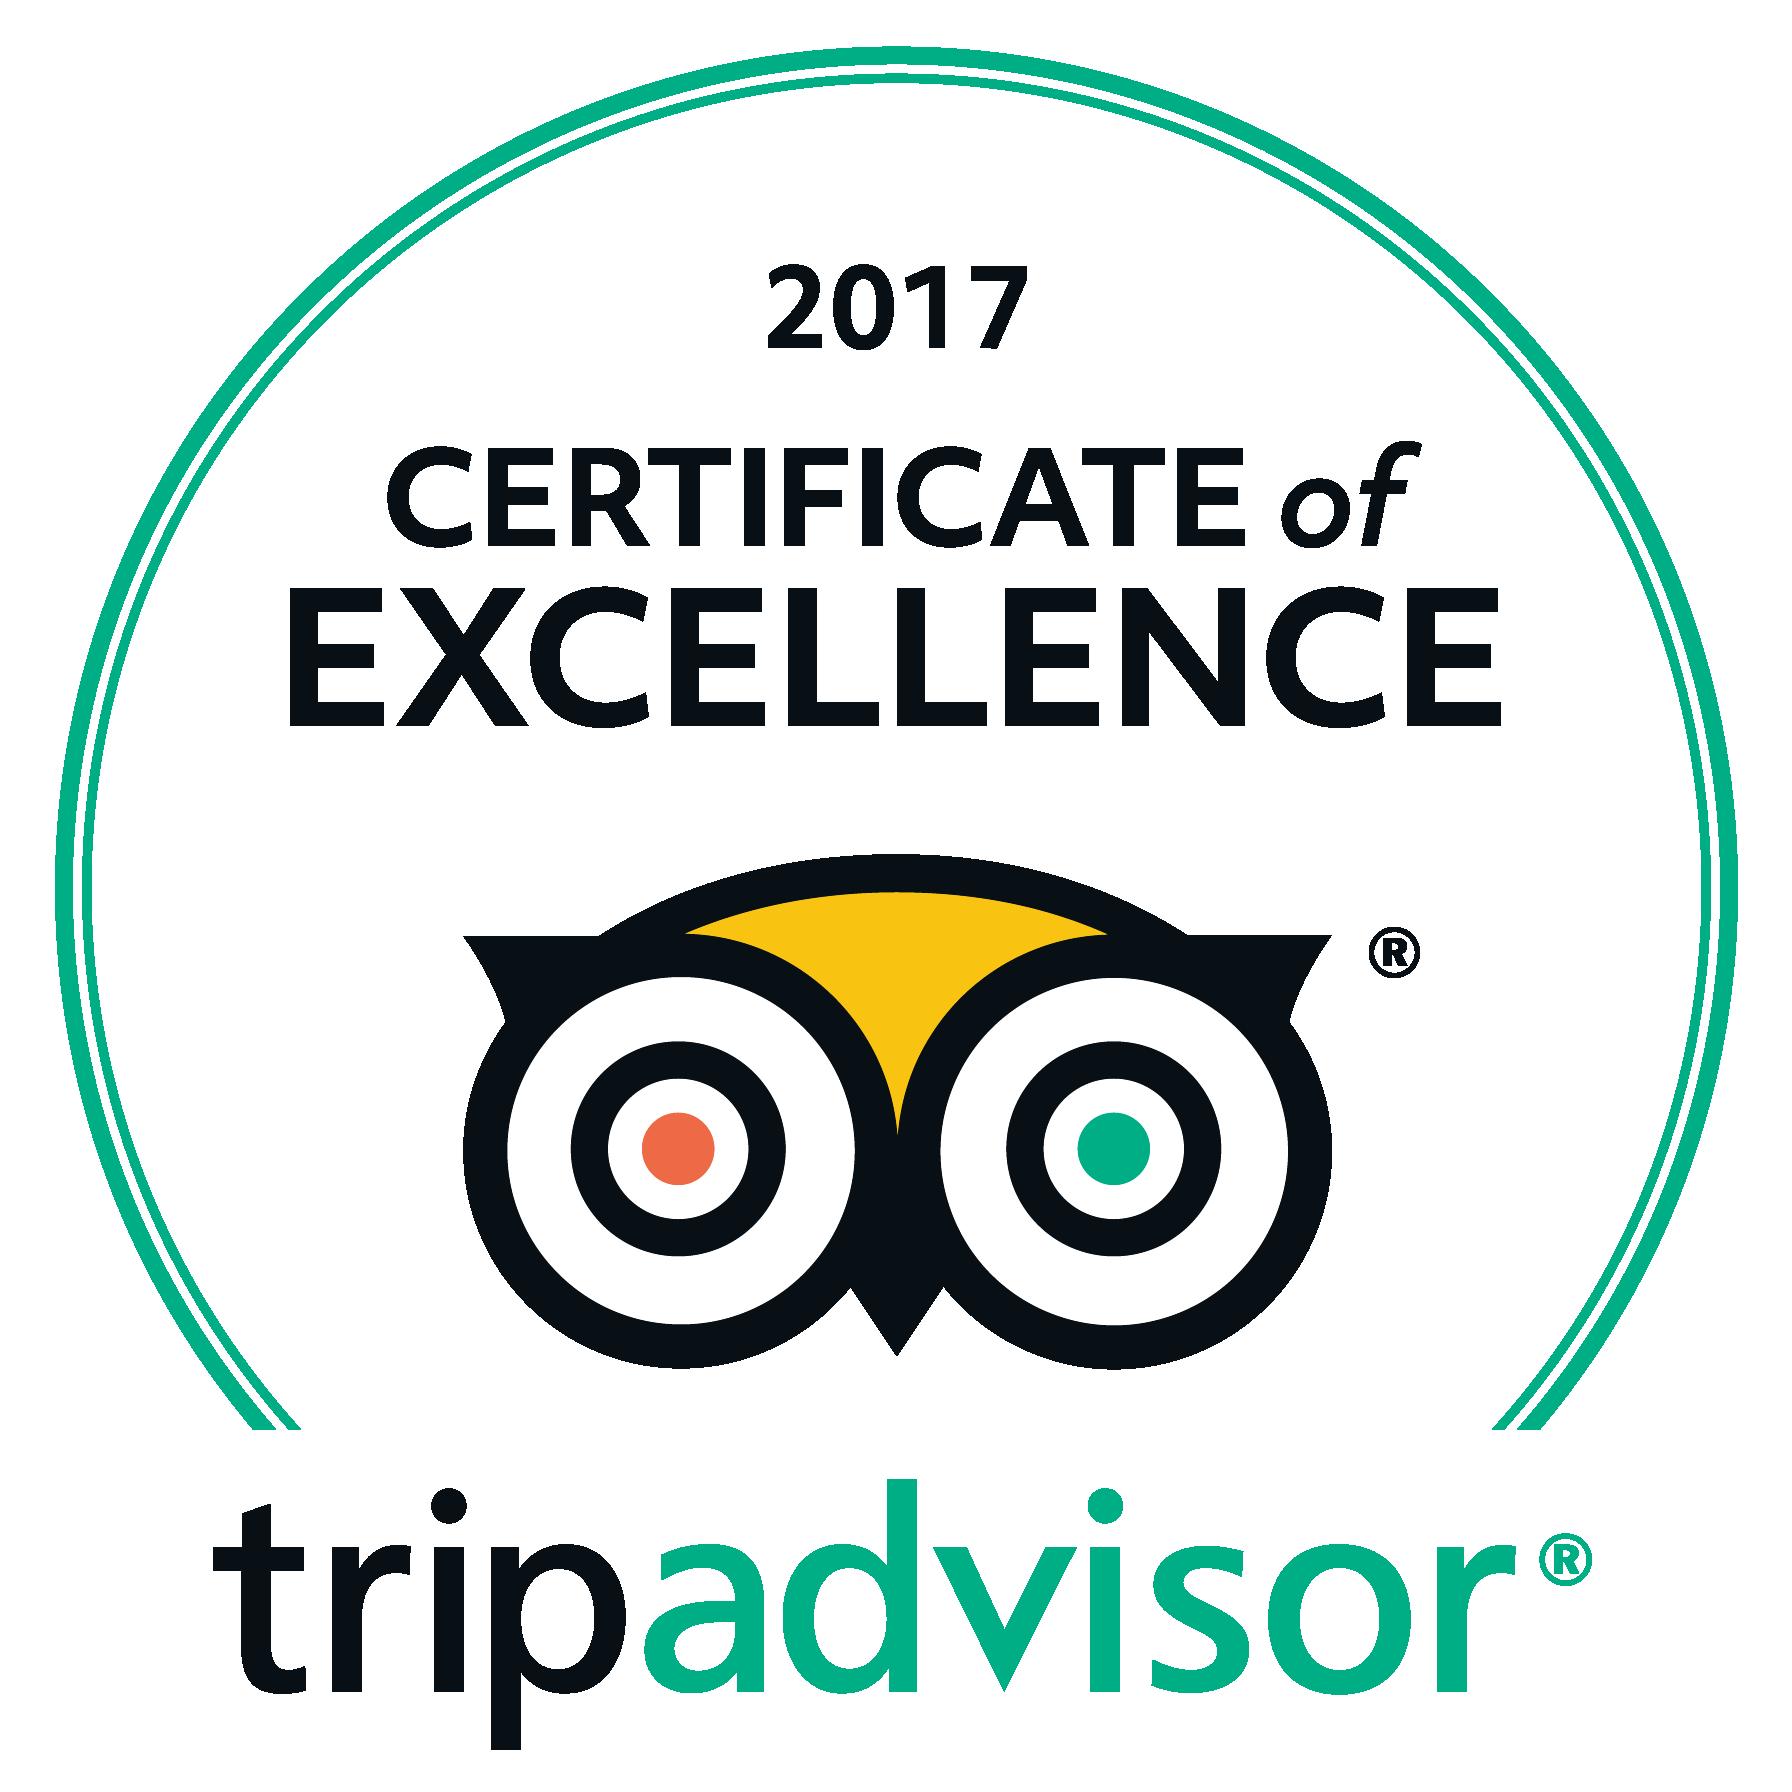 E-bike Winetours - TripAdvisor Certificate of Excellence 2017